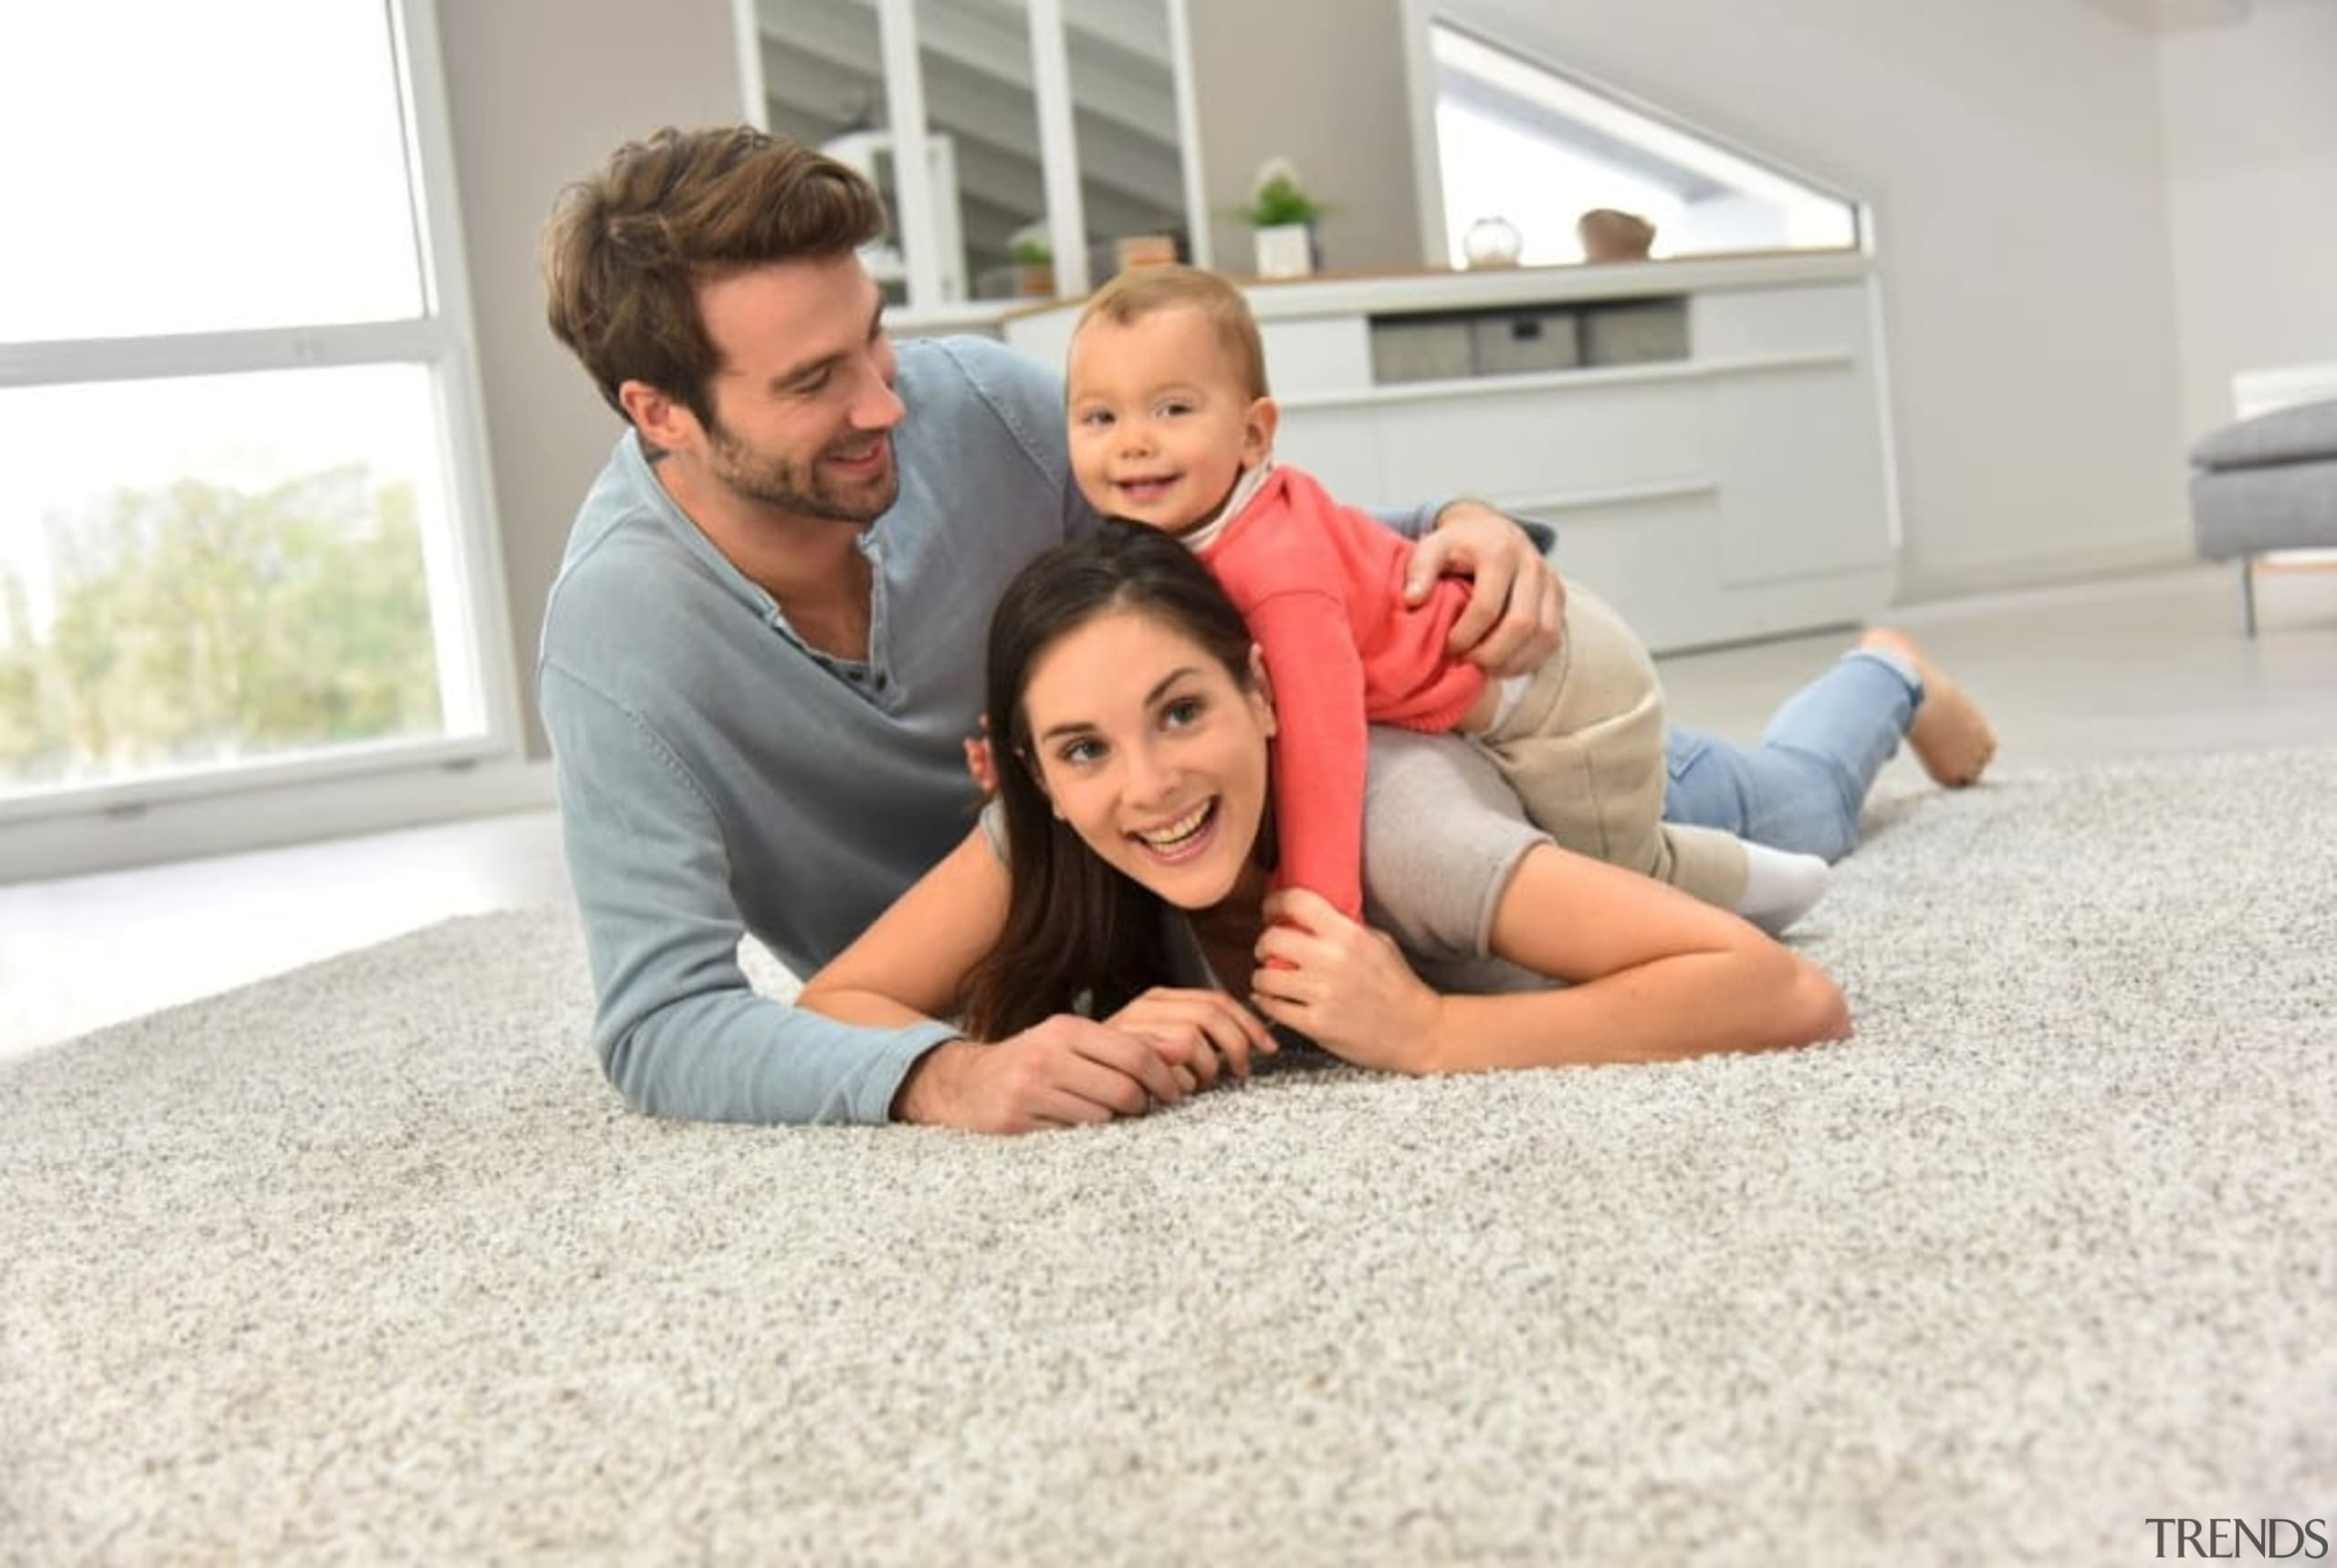 Undercarpet Heating - child | family | flooring child, family, flooring, fun, people, photograph, photography, sitting, white